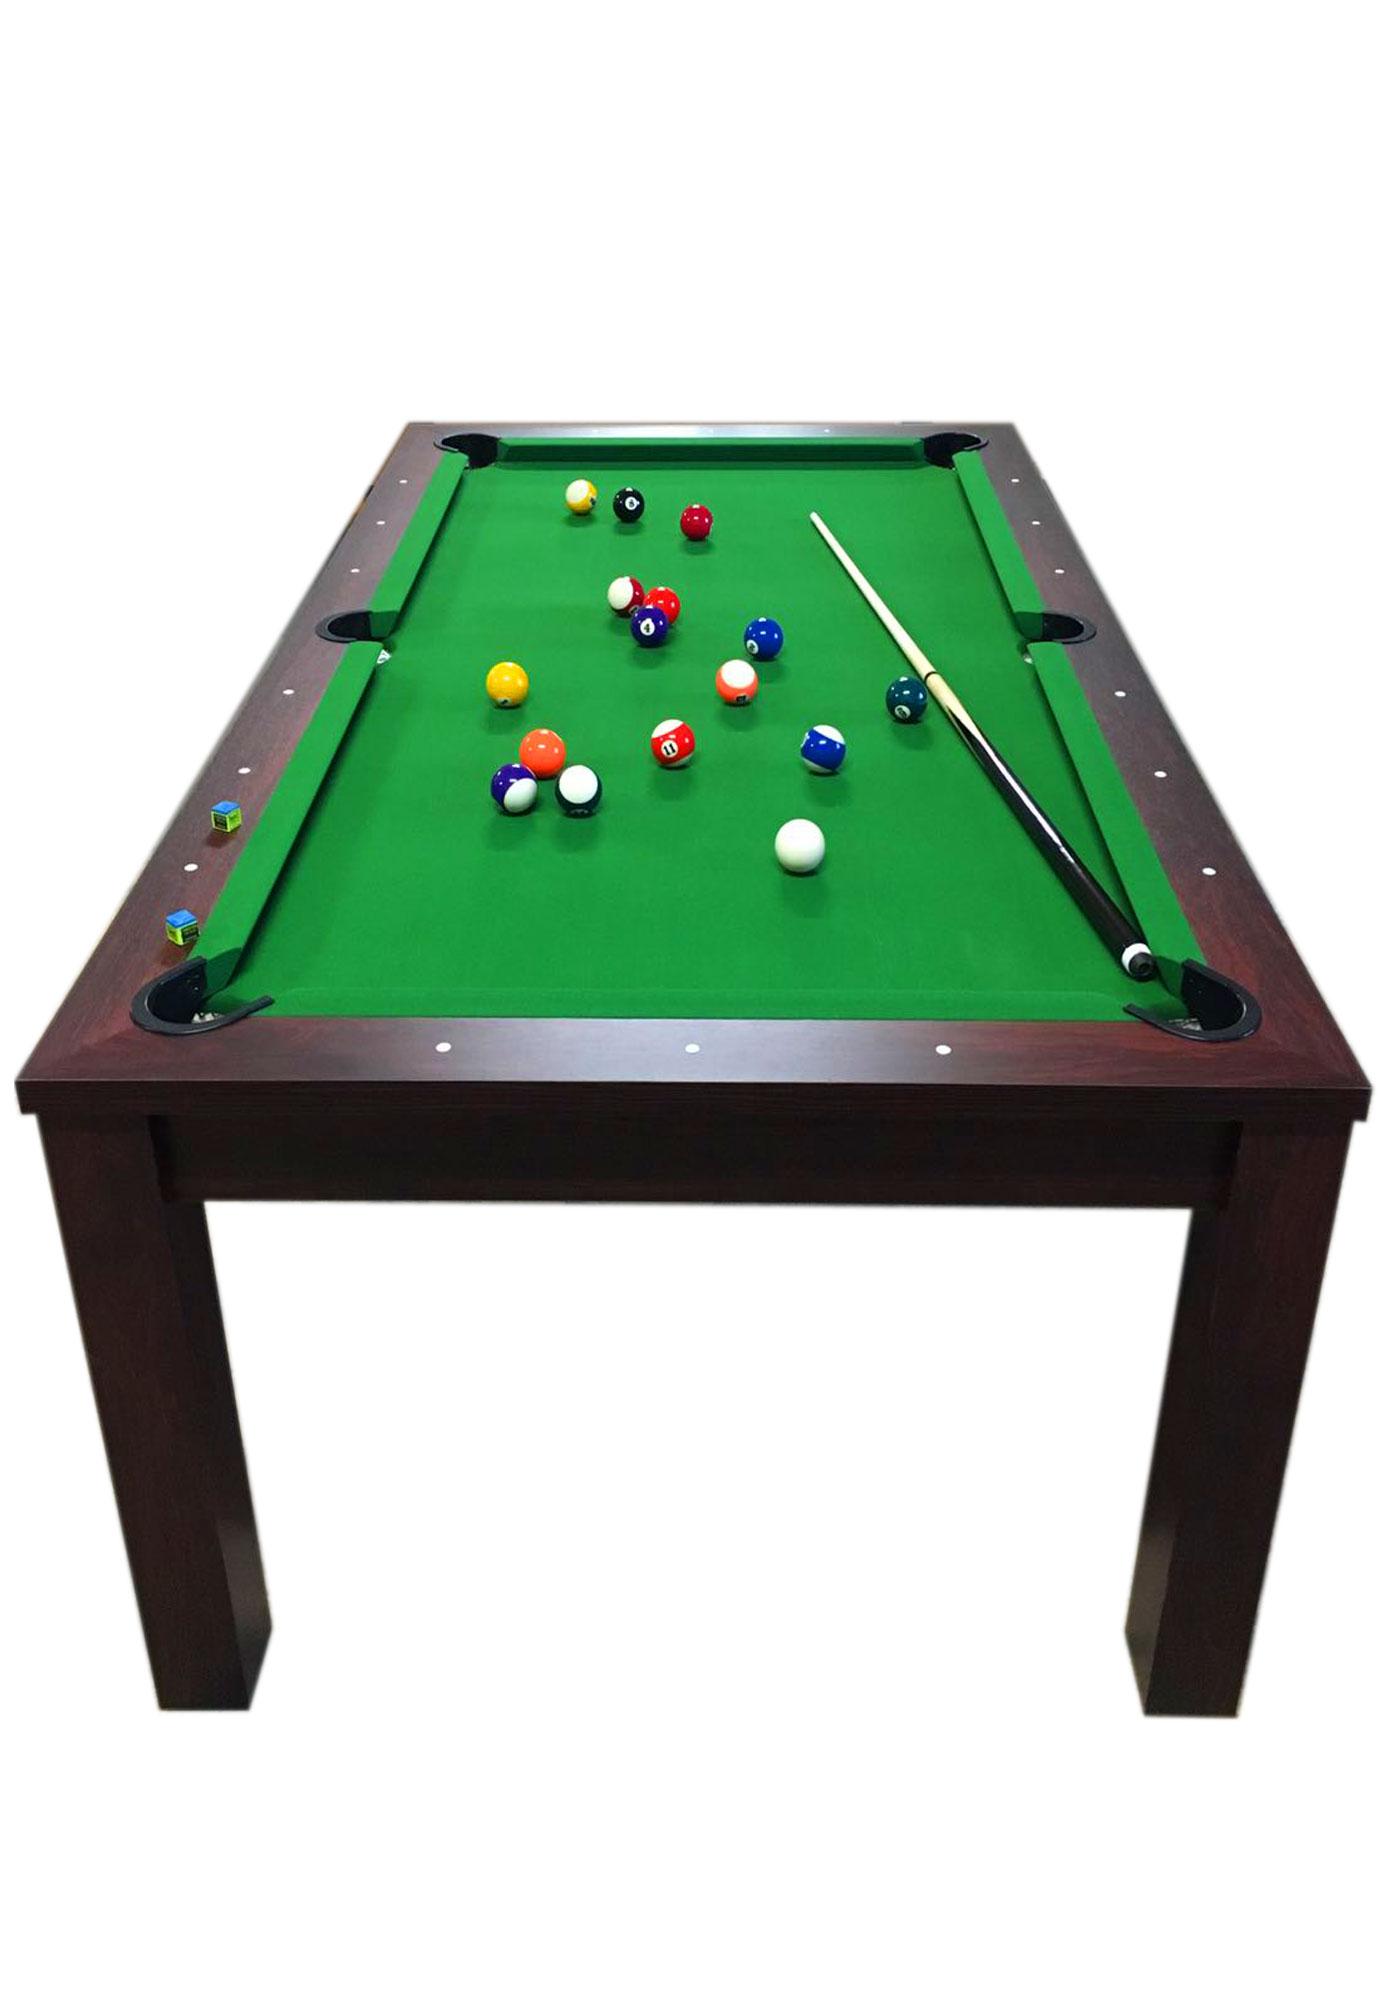 Snooker Pool